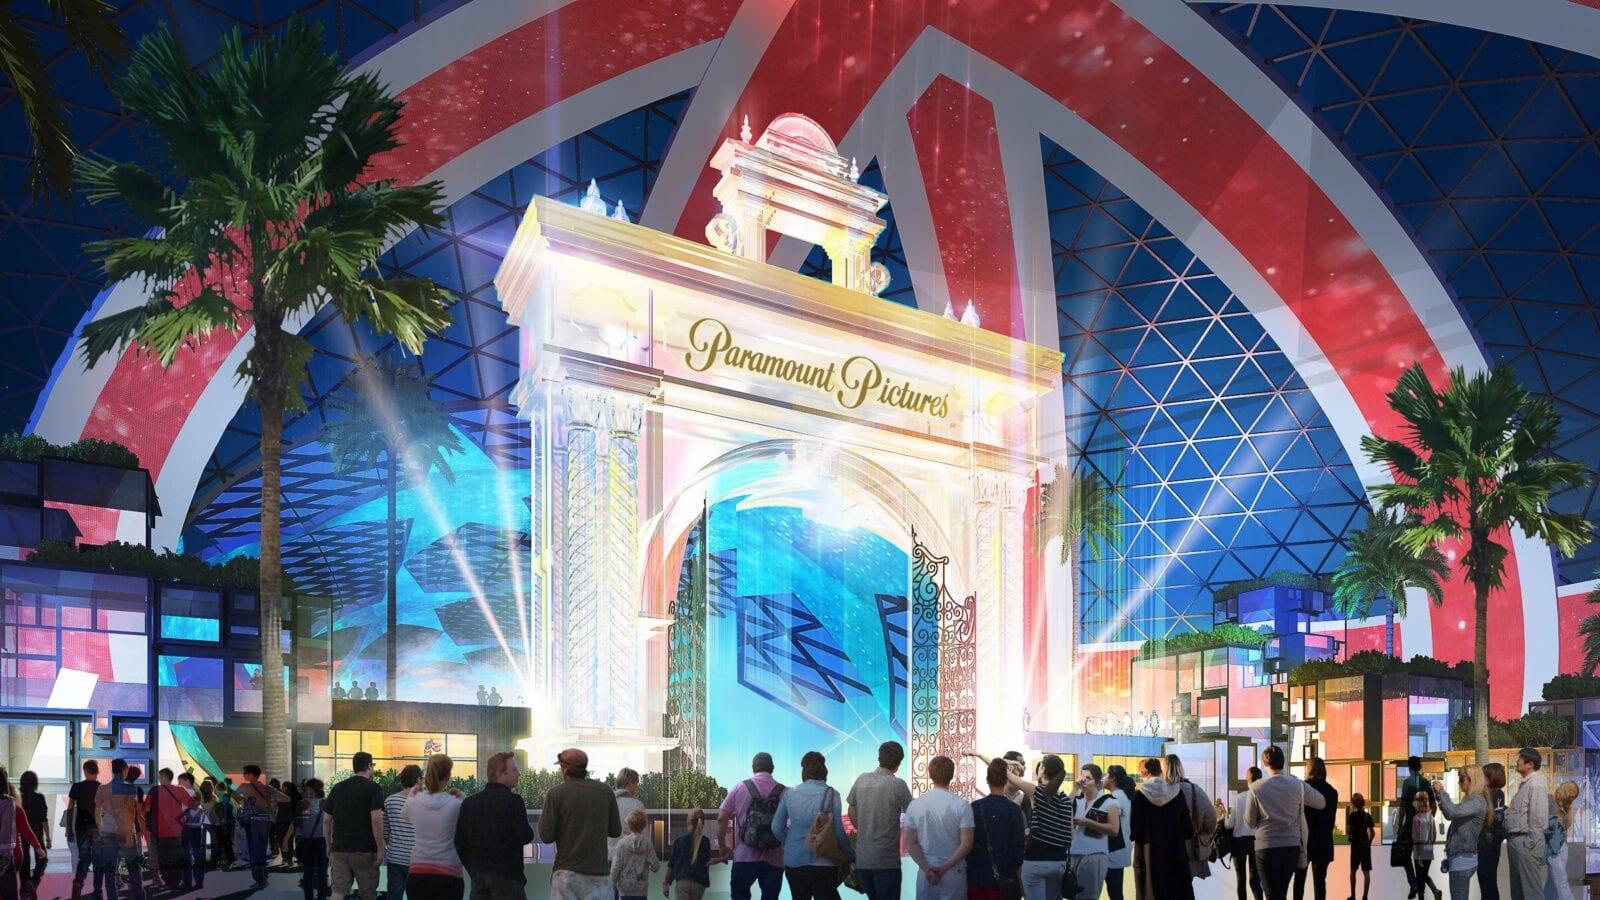 'UK Disneyland' theme park The London Resort reveals new artwork, The Manc